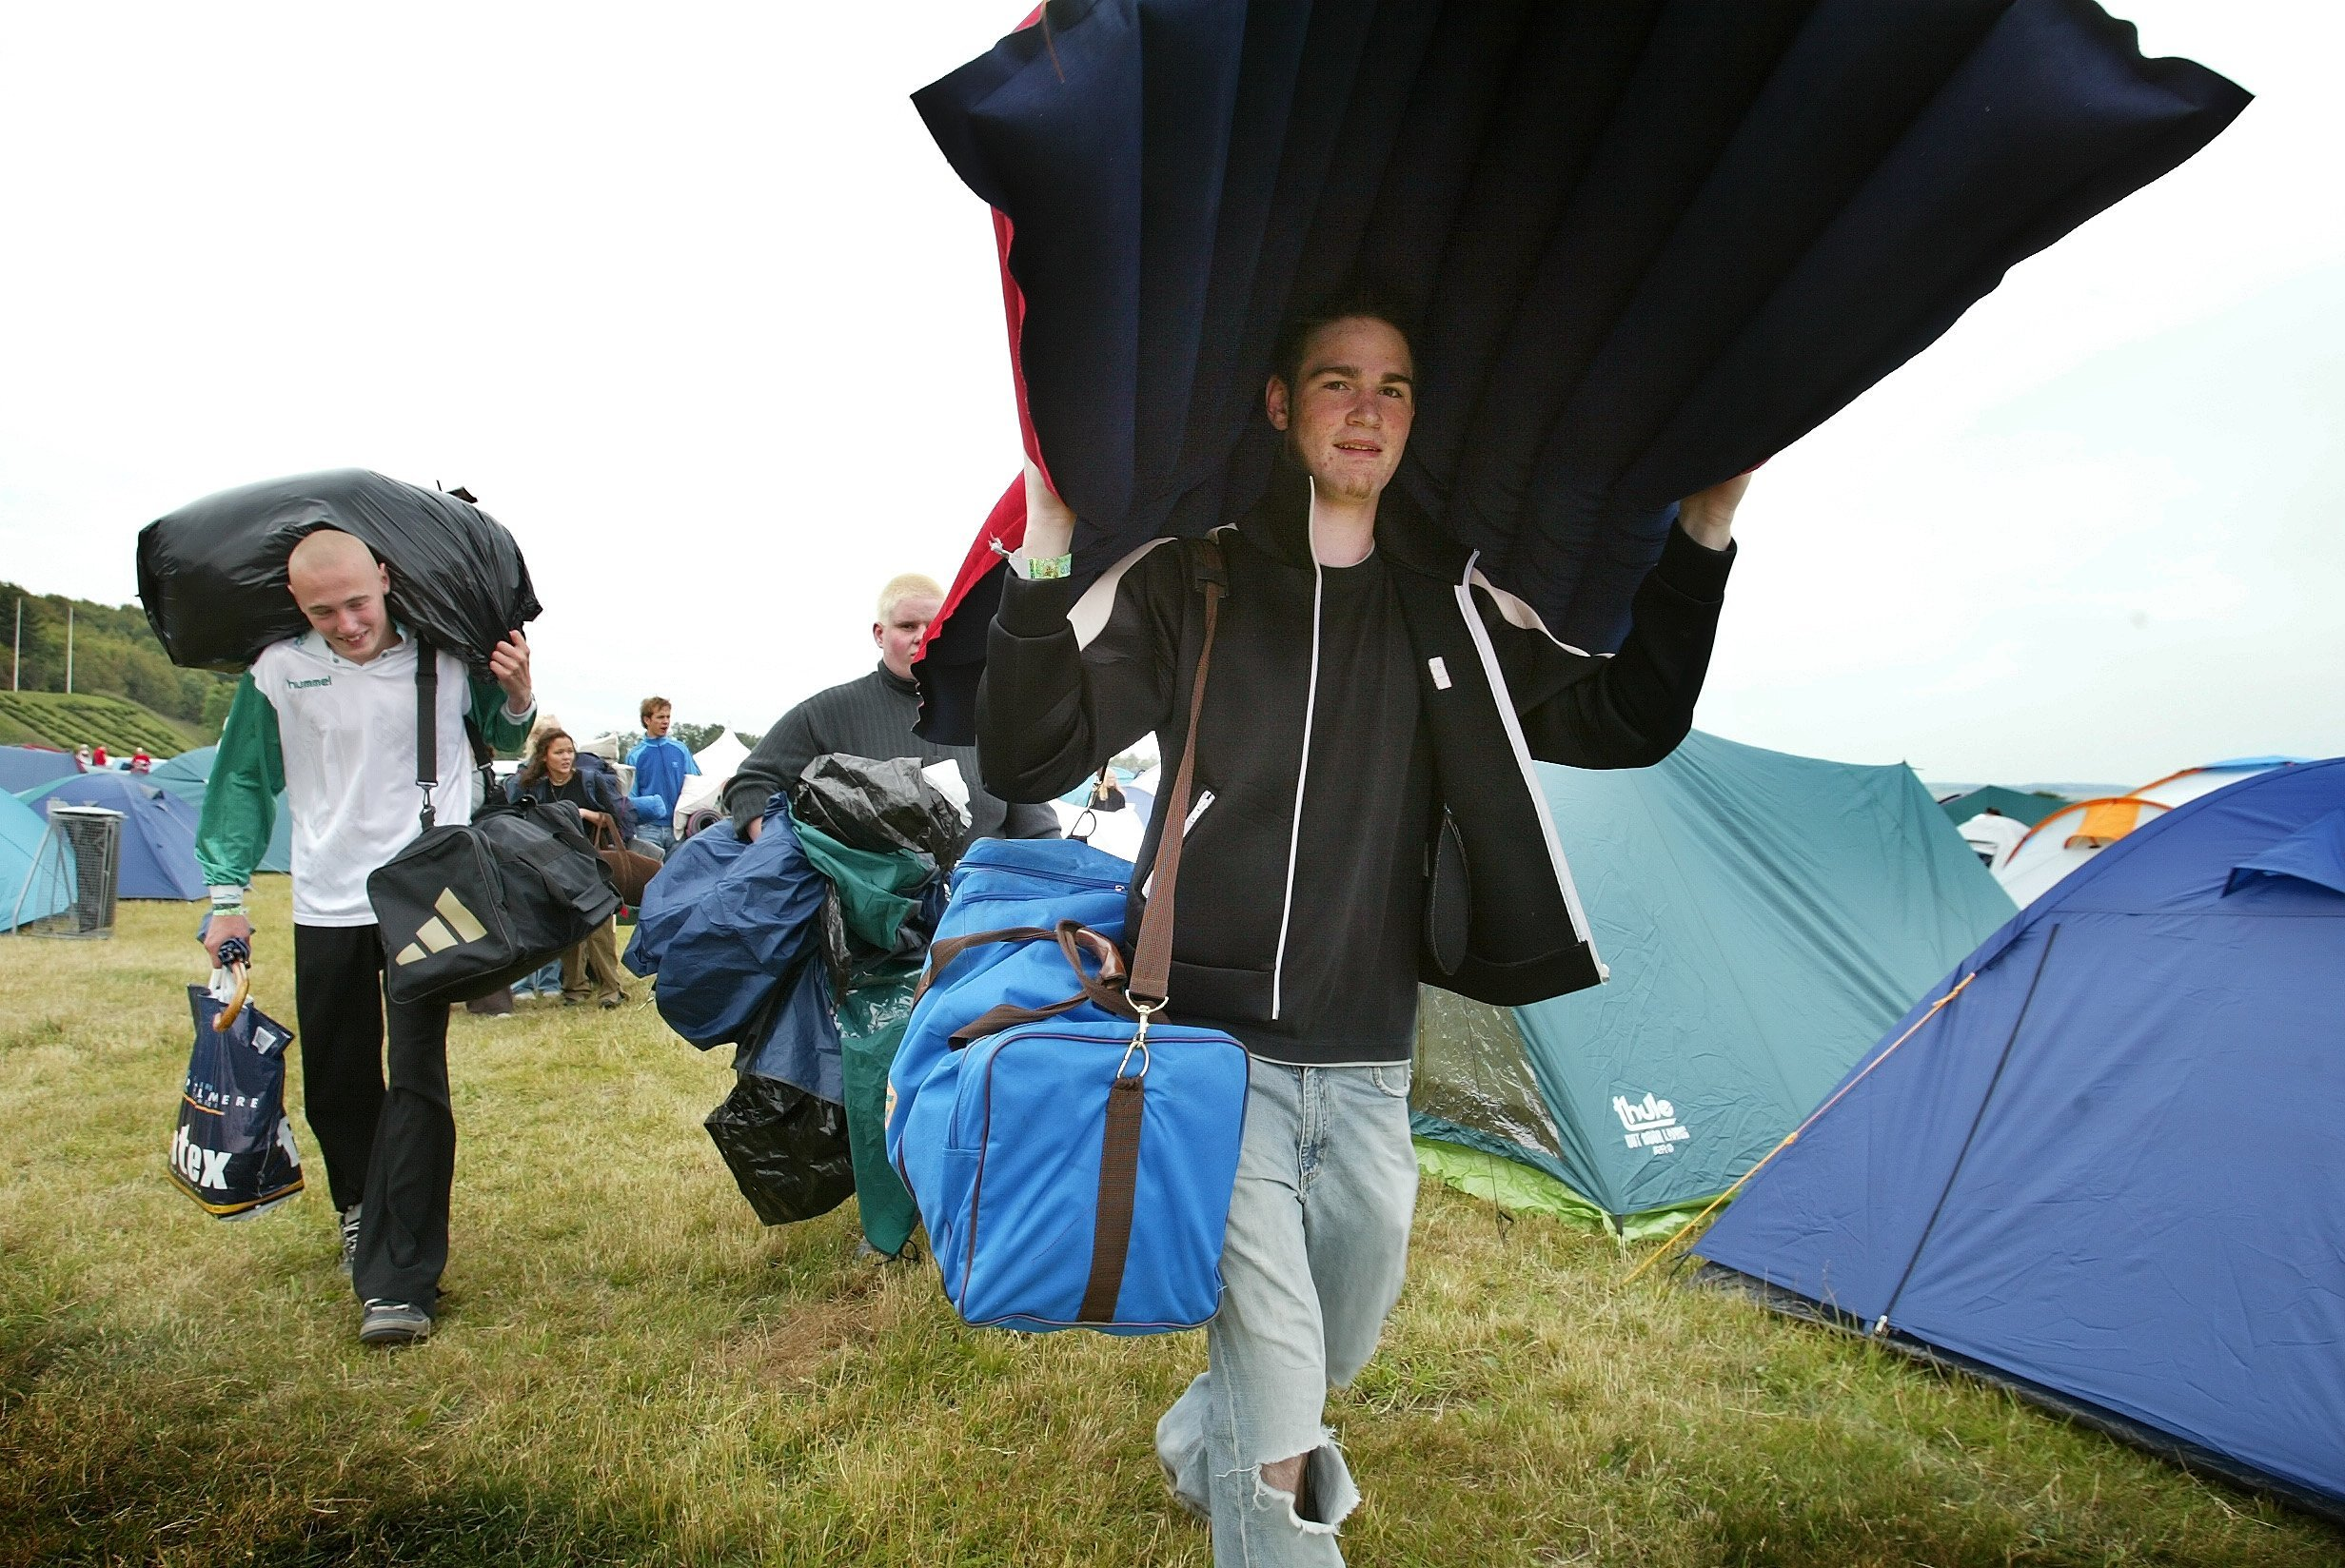 Nibe Festival uddeler en million til festivalens frivillige